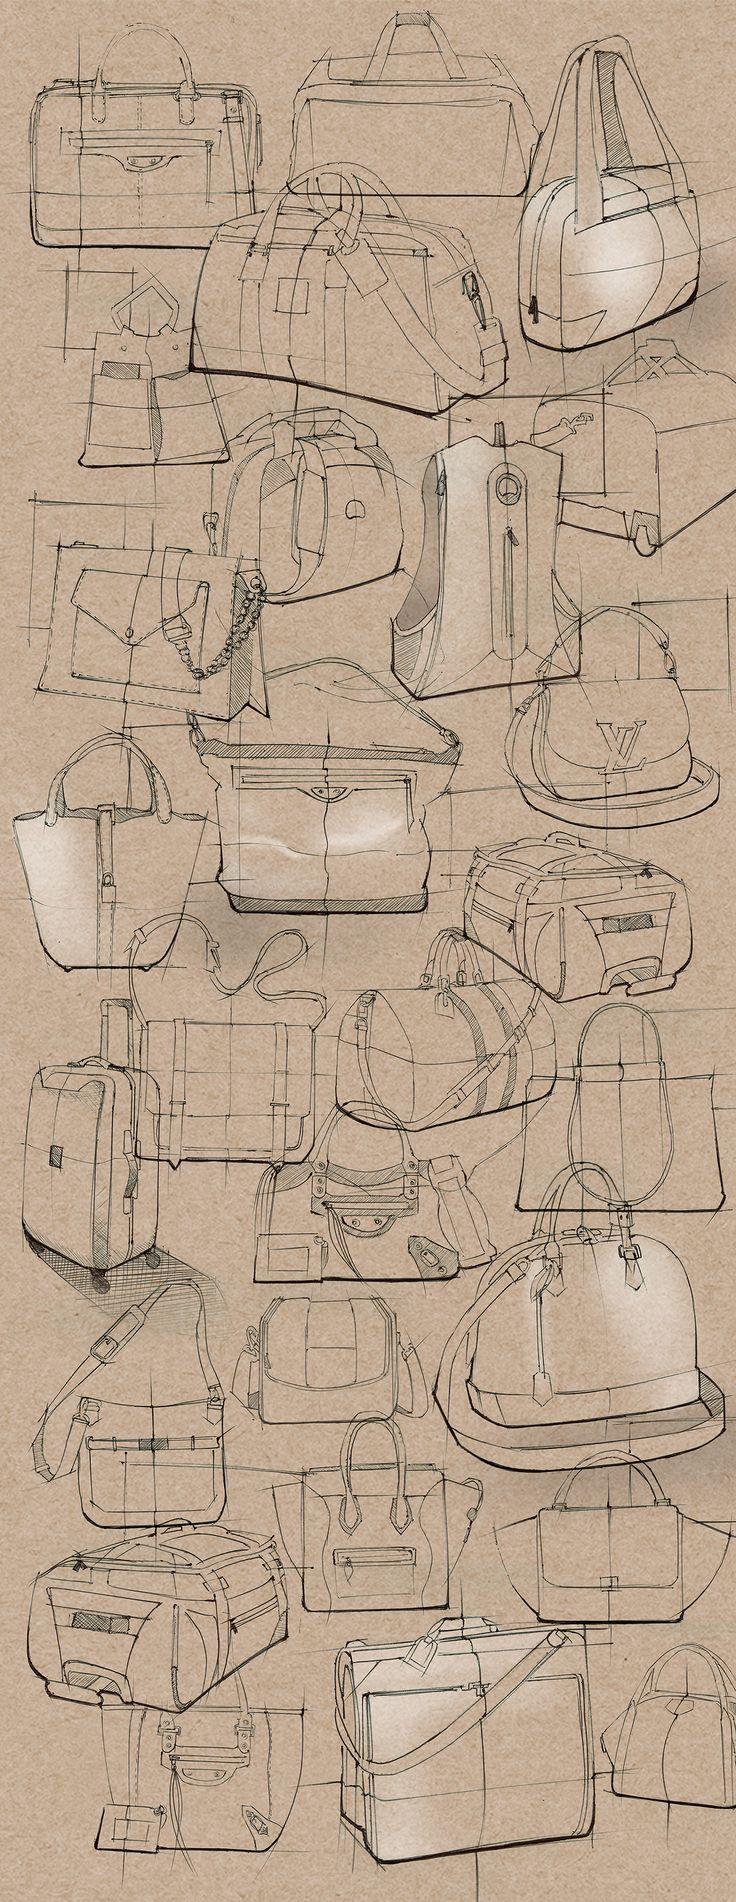 SKETCHBOOK-Sketches on Behance--------이렇게 깔끔해보이게 스케치하는 연습을 할때 참고하자